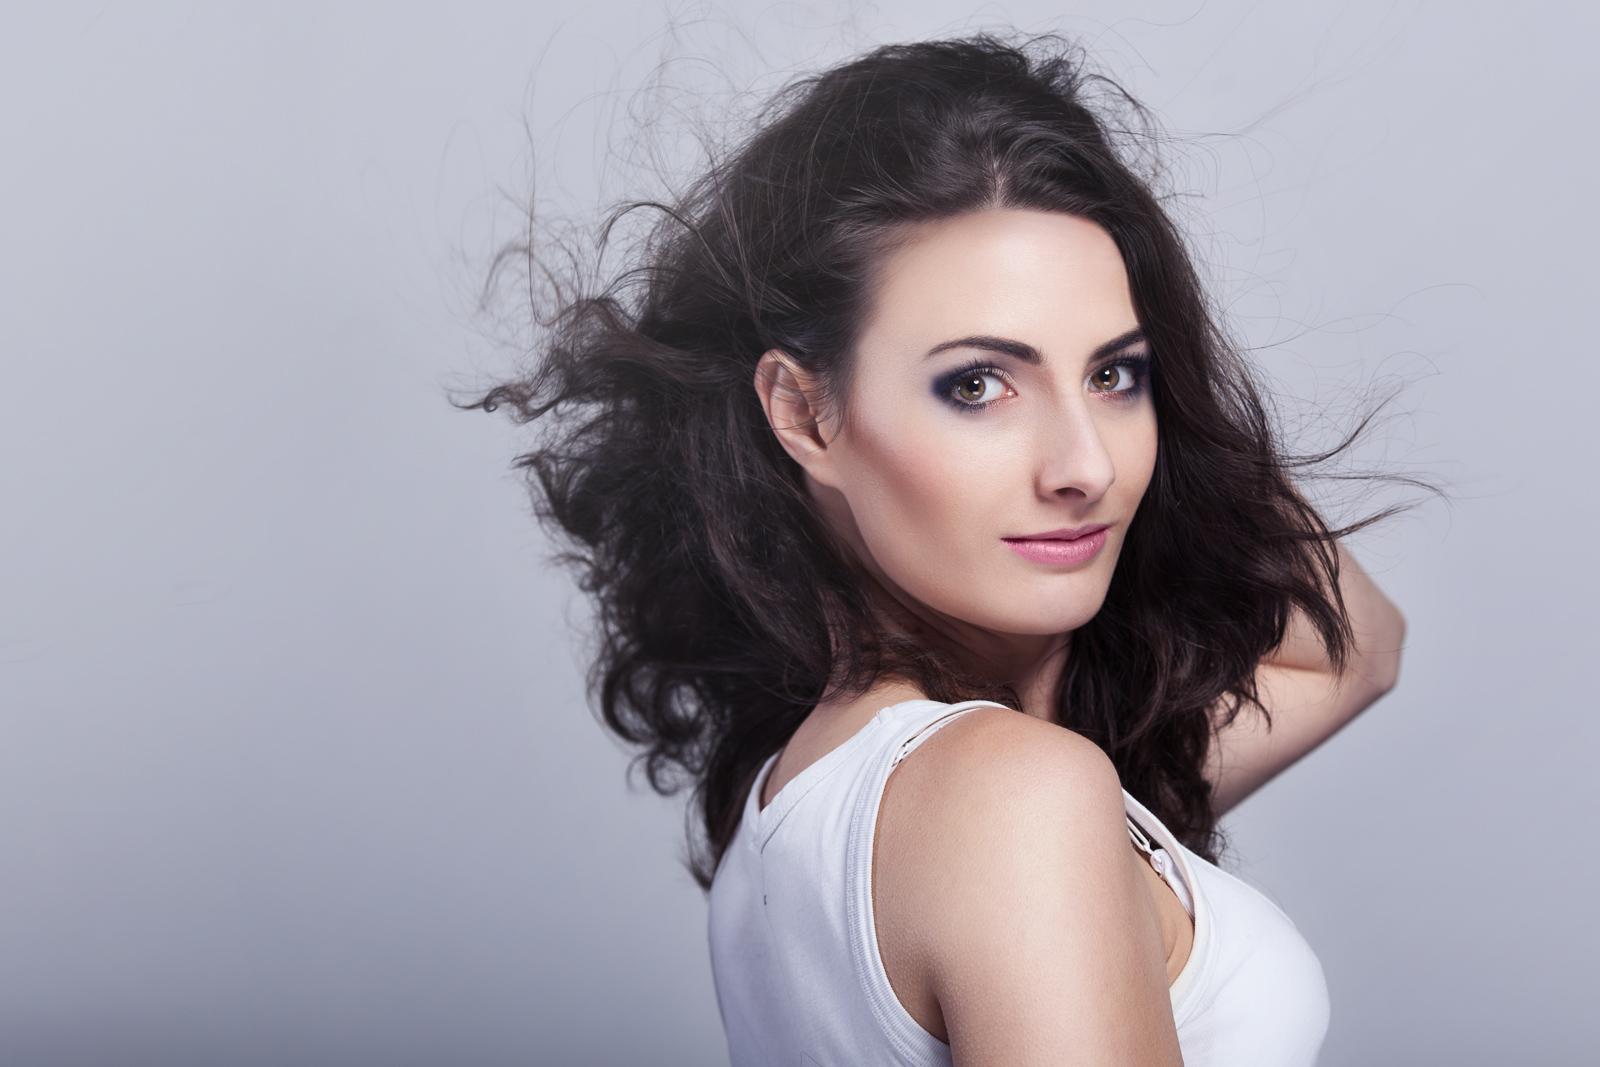 wizaż – Justyna Polska, modelka – Monika Witek, fot. Adam Duraj (2)